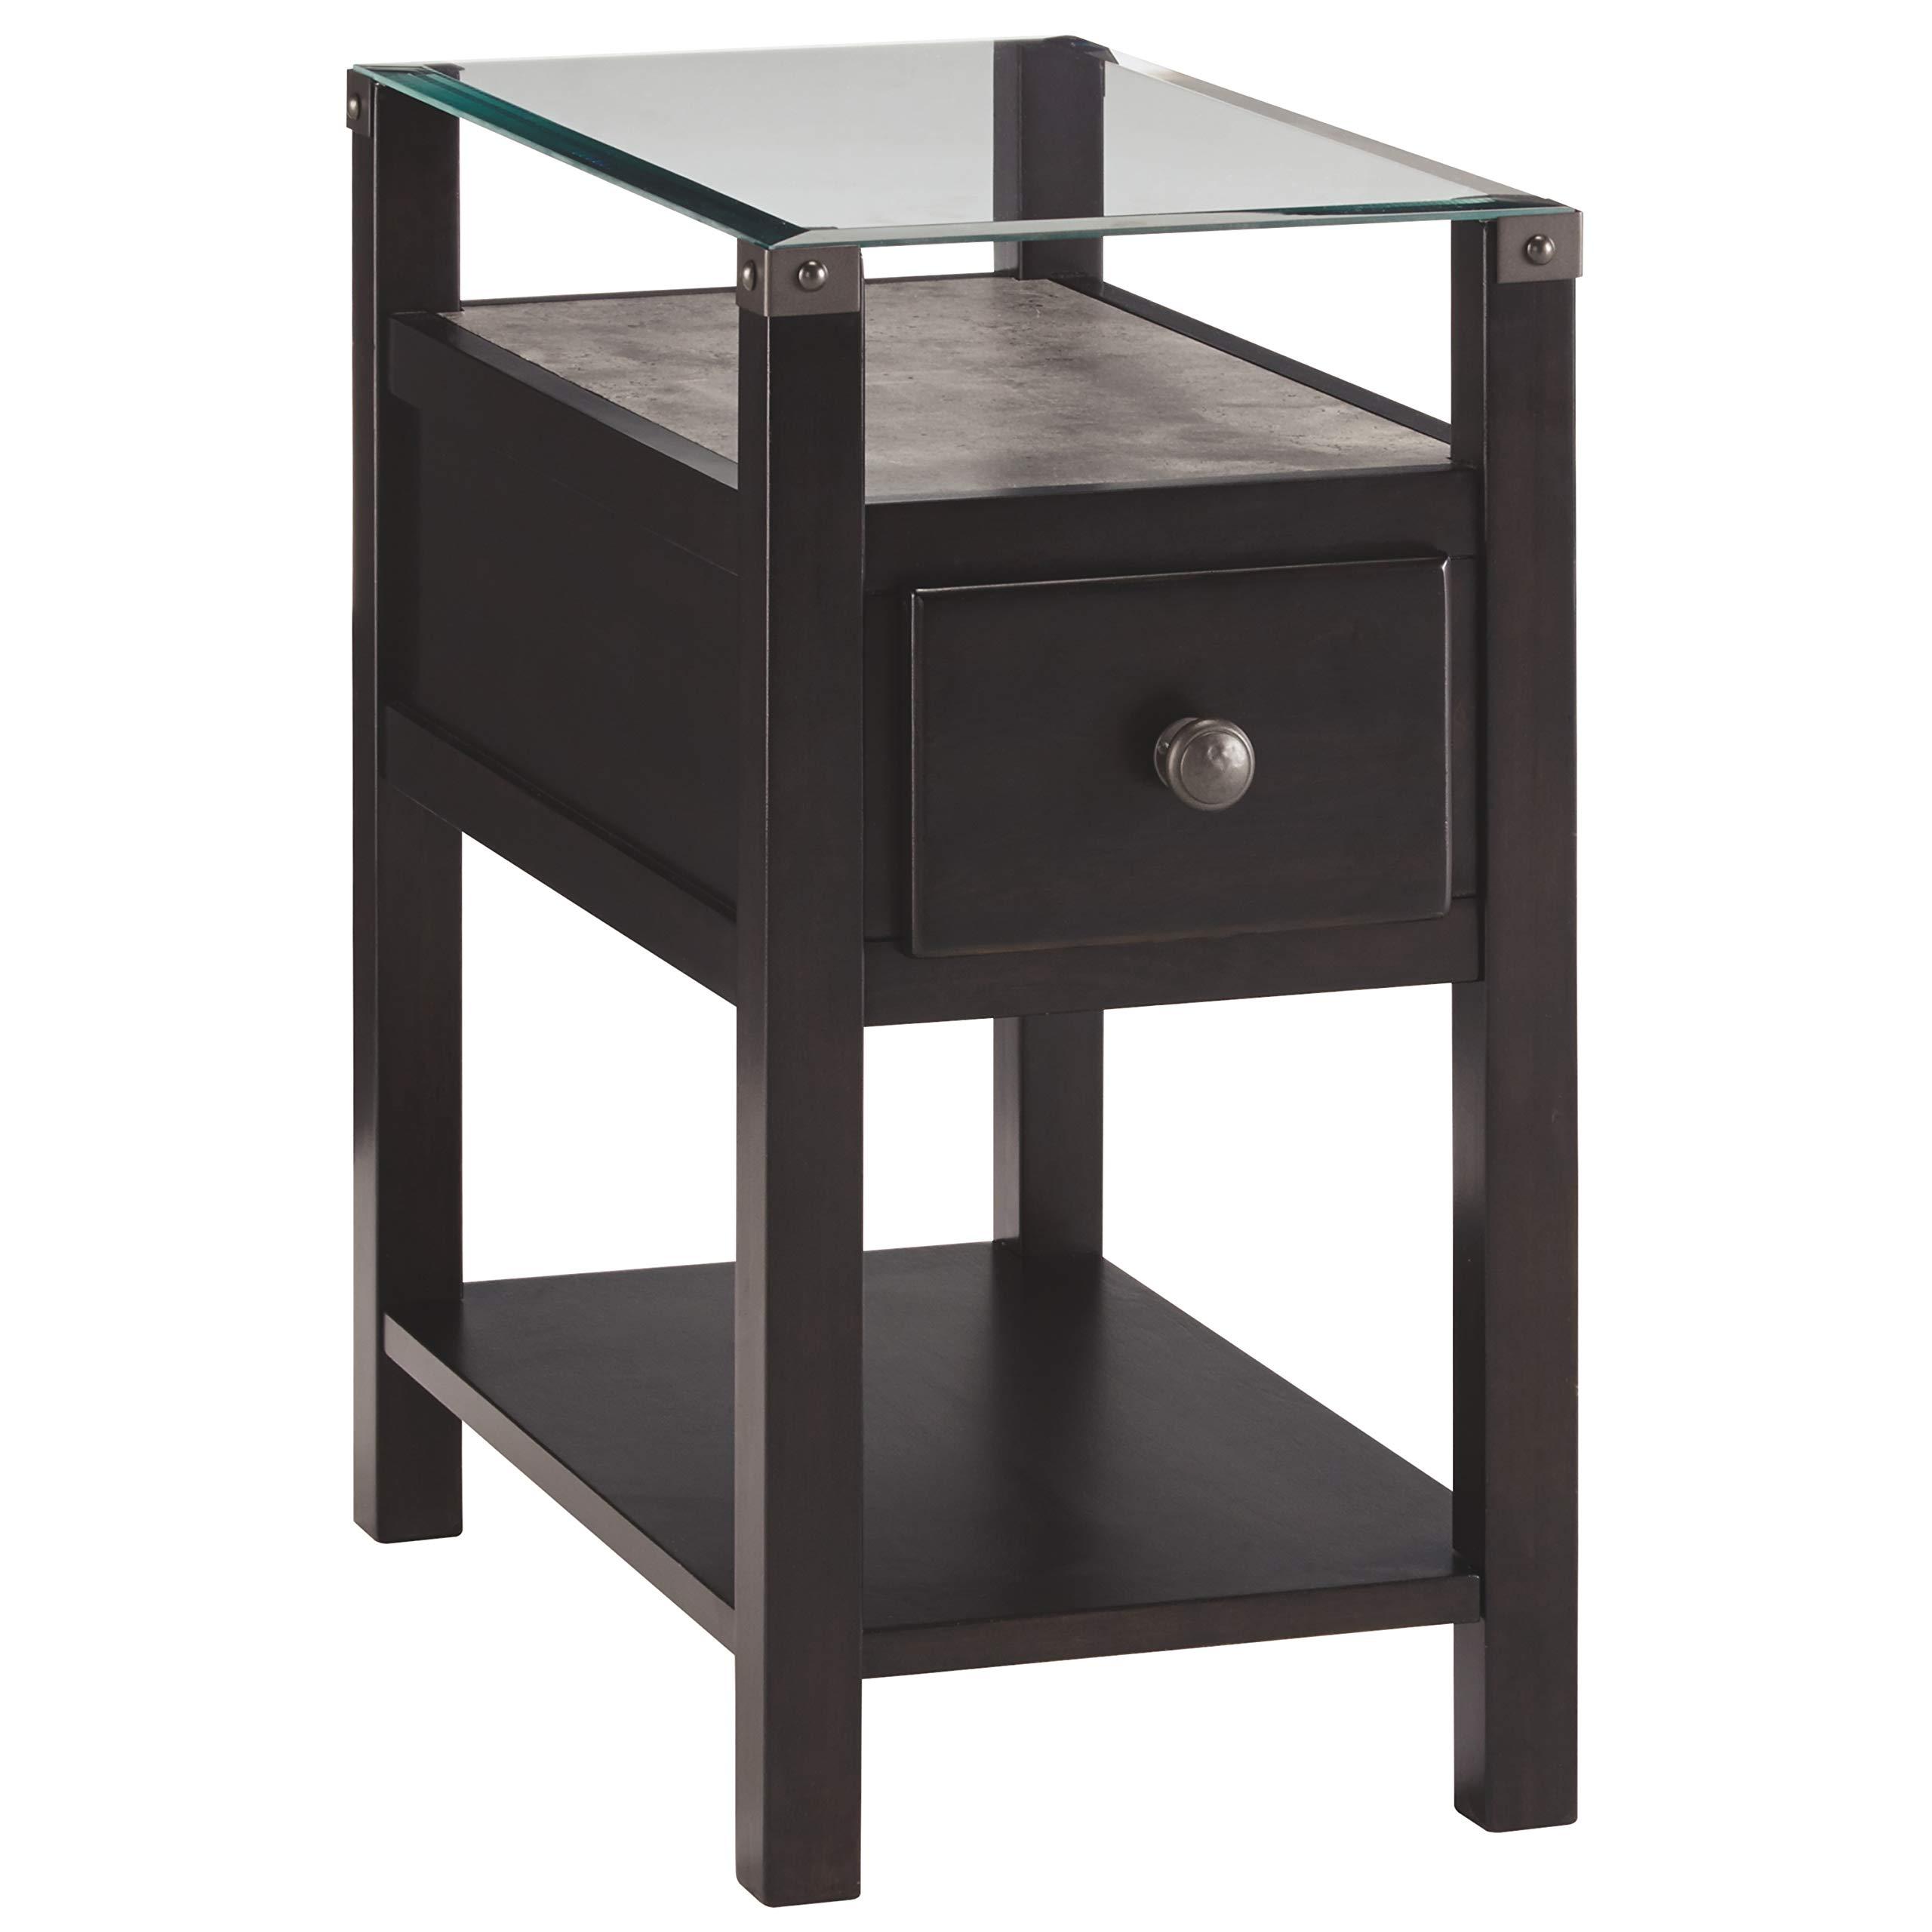 Signature Design by Ashley Diamenton Chair Side End Table Multi by Signature Design by Ashley